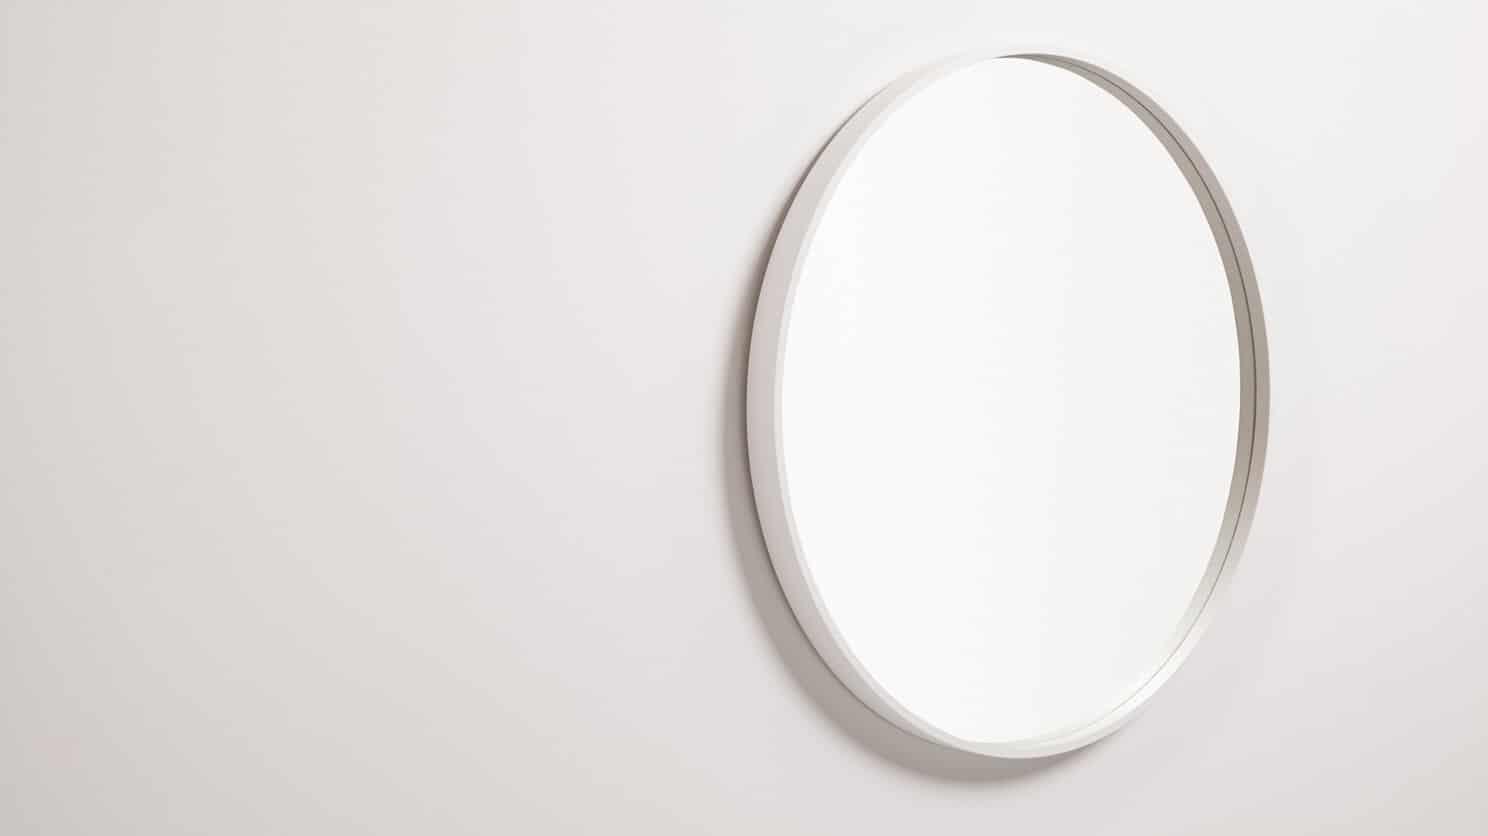 3130 043 6 2 mirror conner large white corner